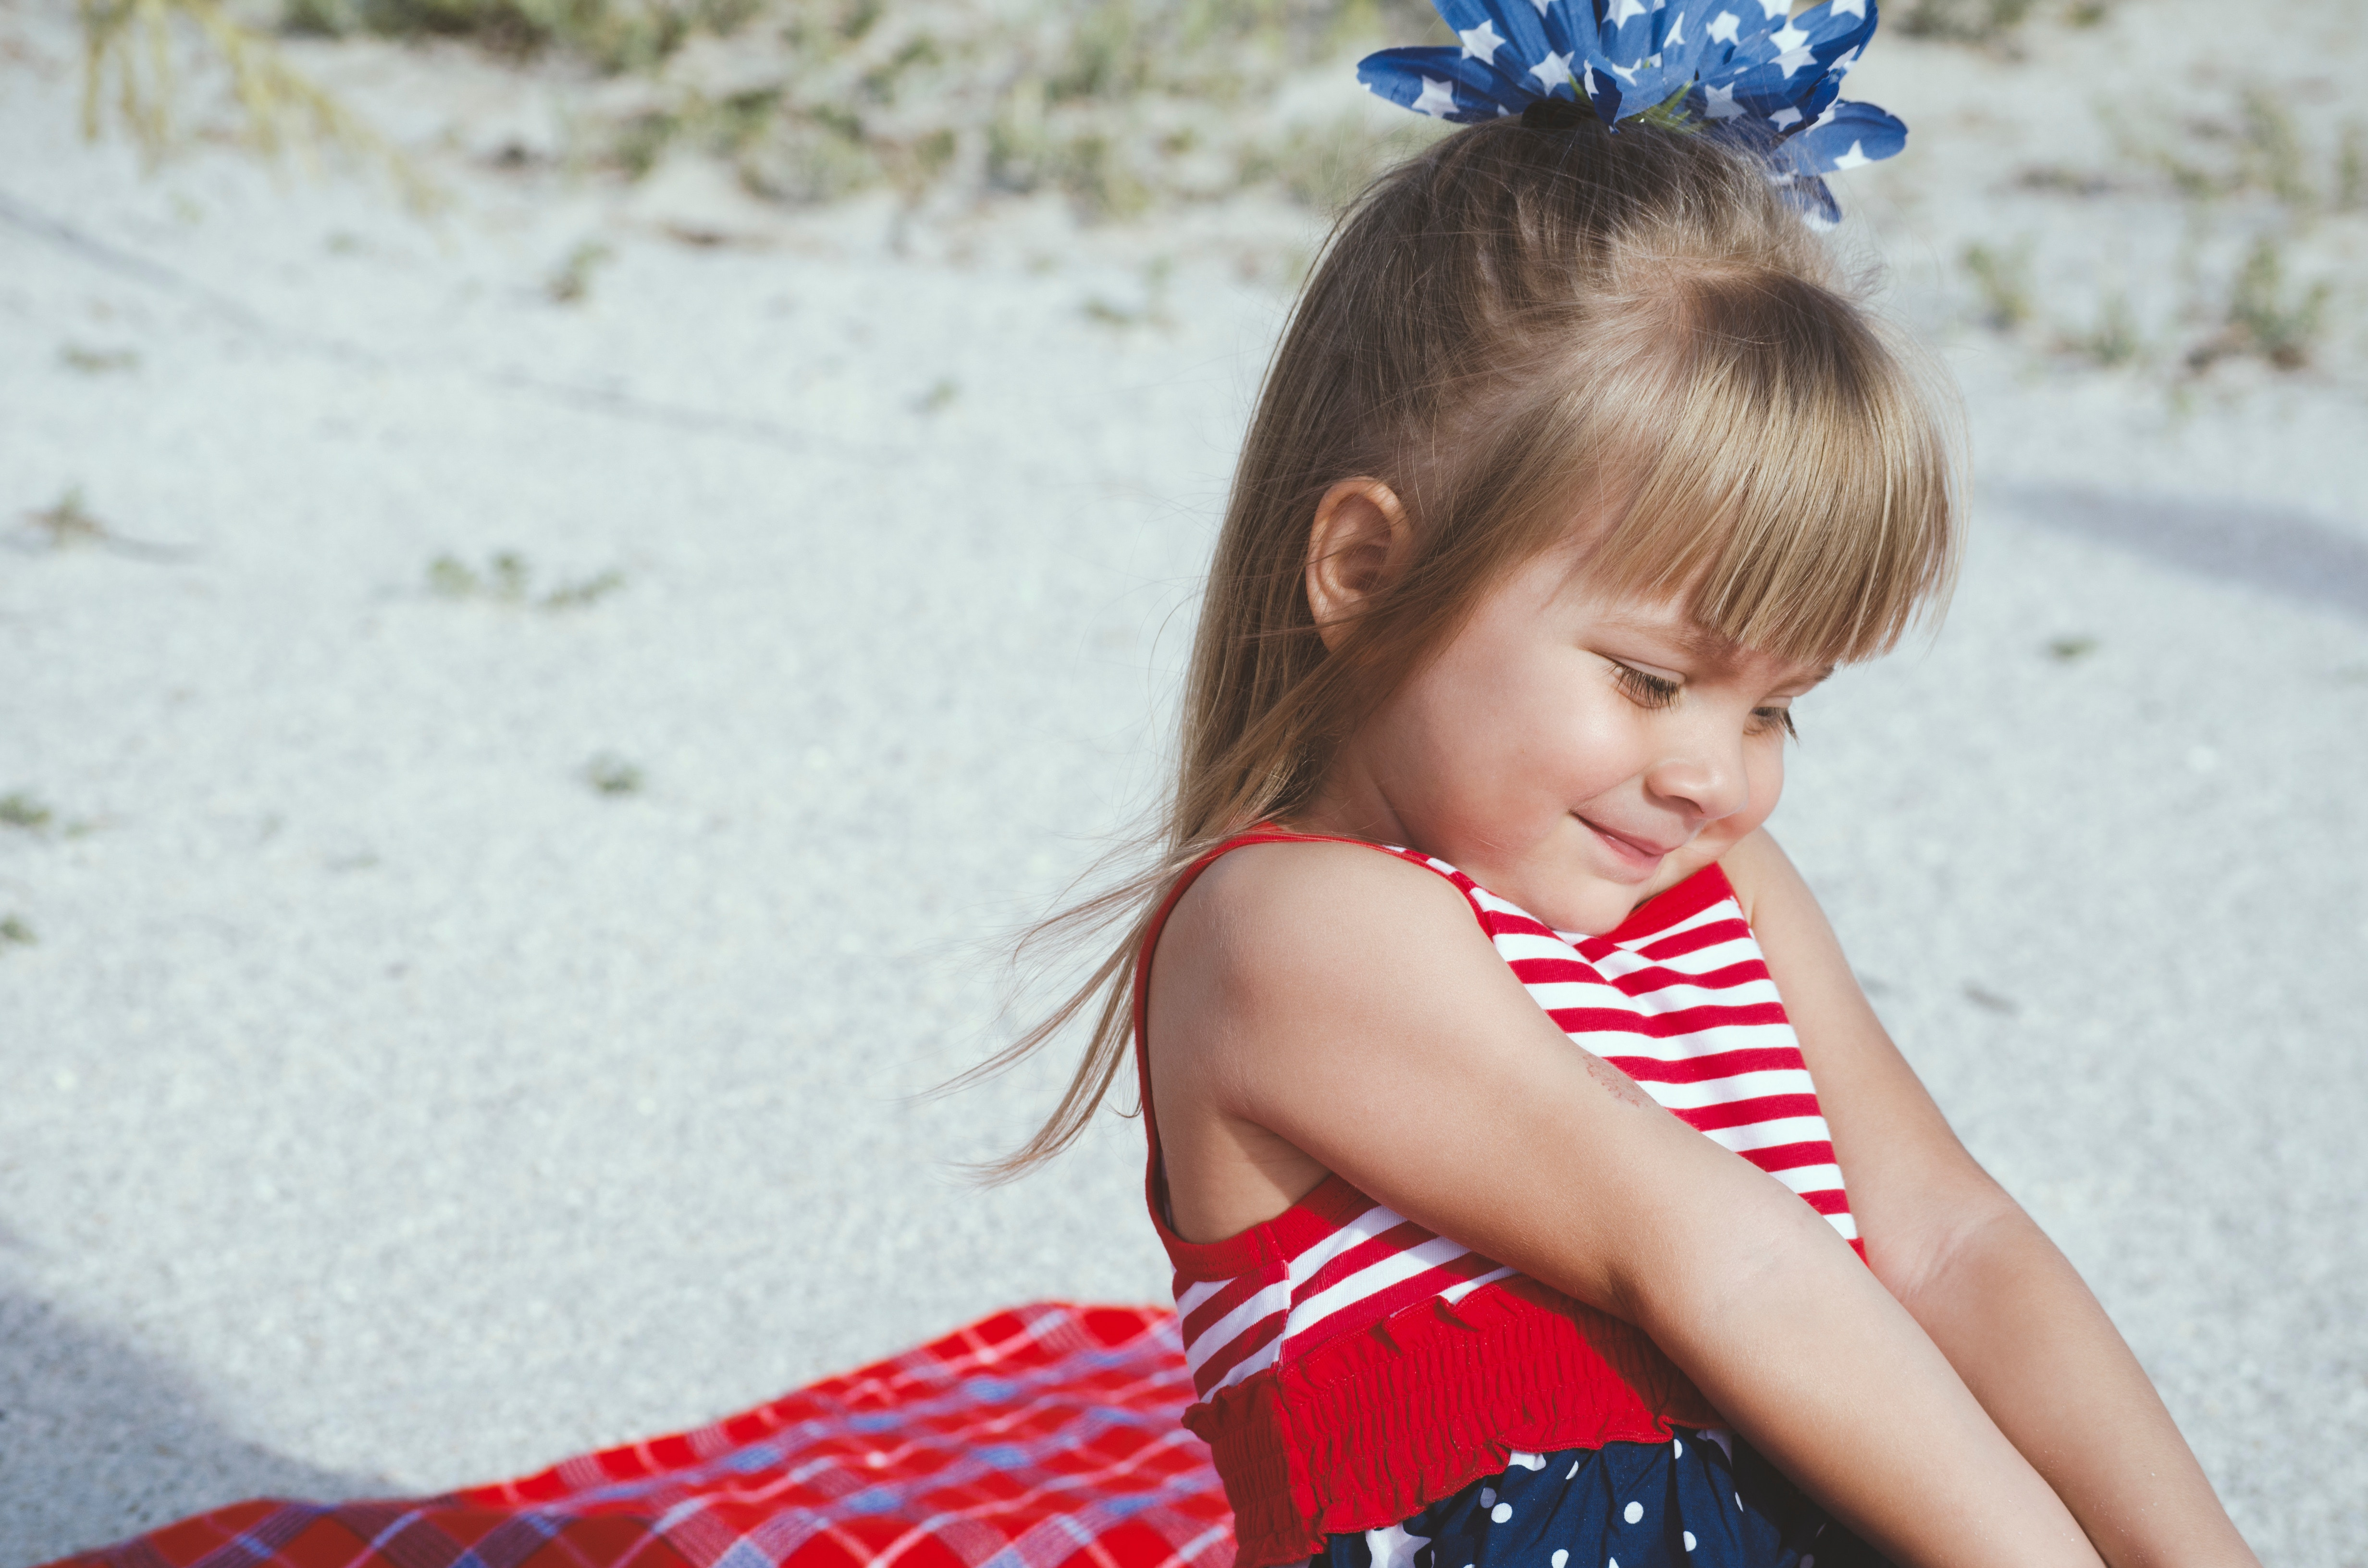 15 Free Ways to Engage Kids this Summer